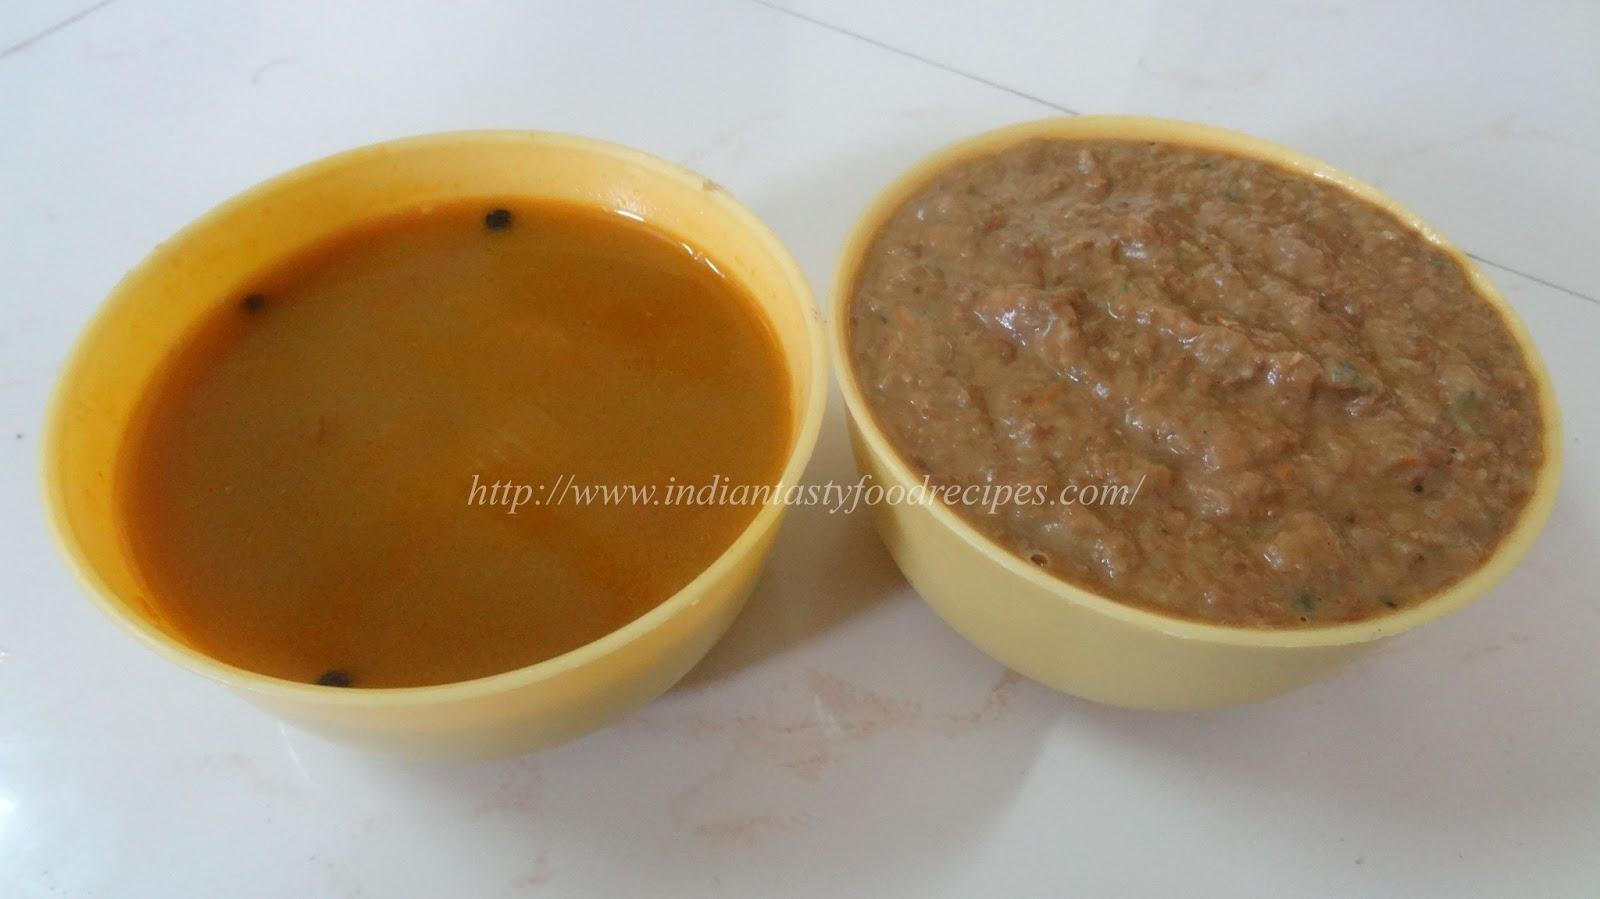 Indian tasty food recipes horse gram or kollu paruppu chutney and rasam forumfinder Gallery